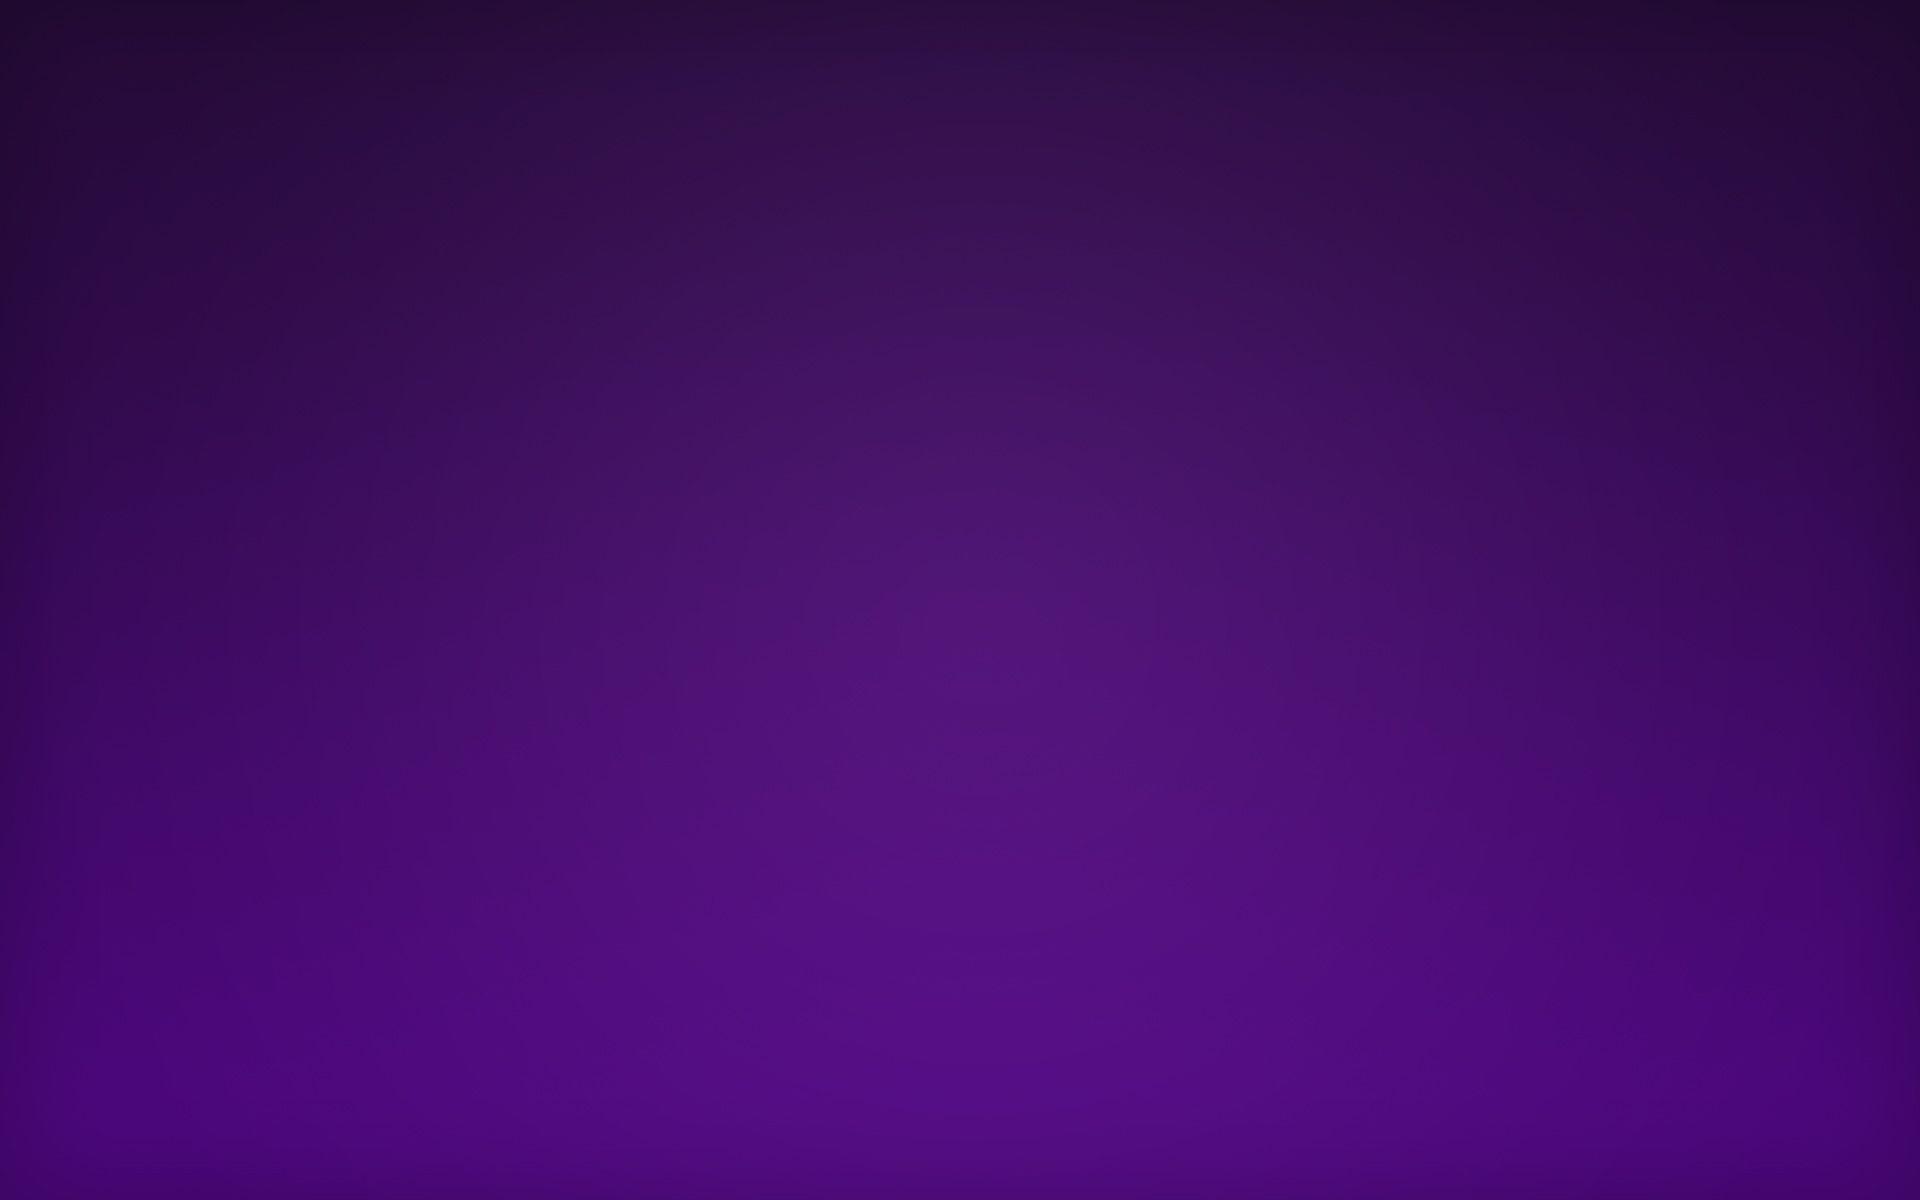 Dark Purple Wallpapers 1920x1200